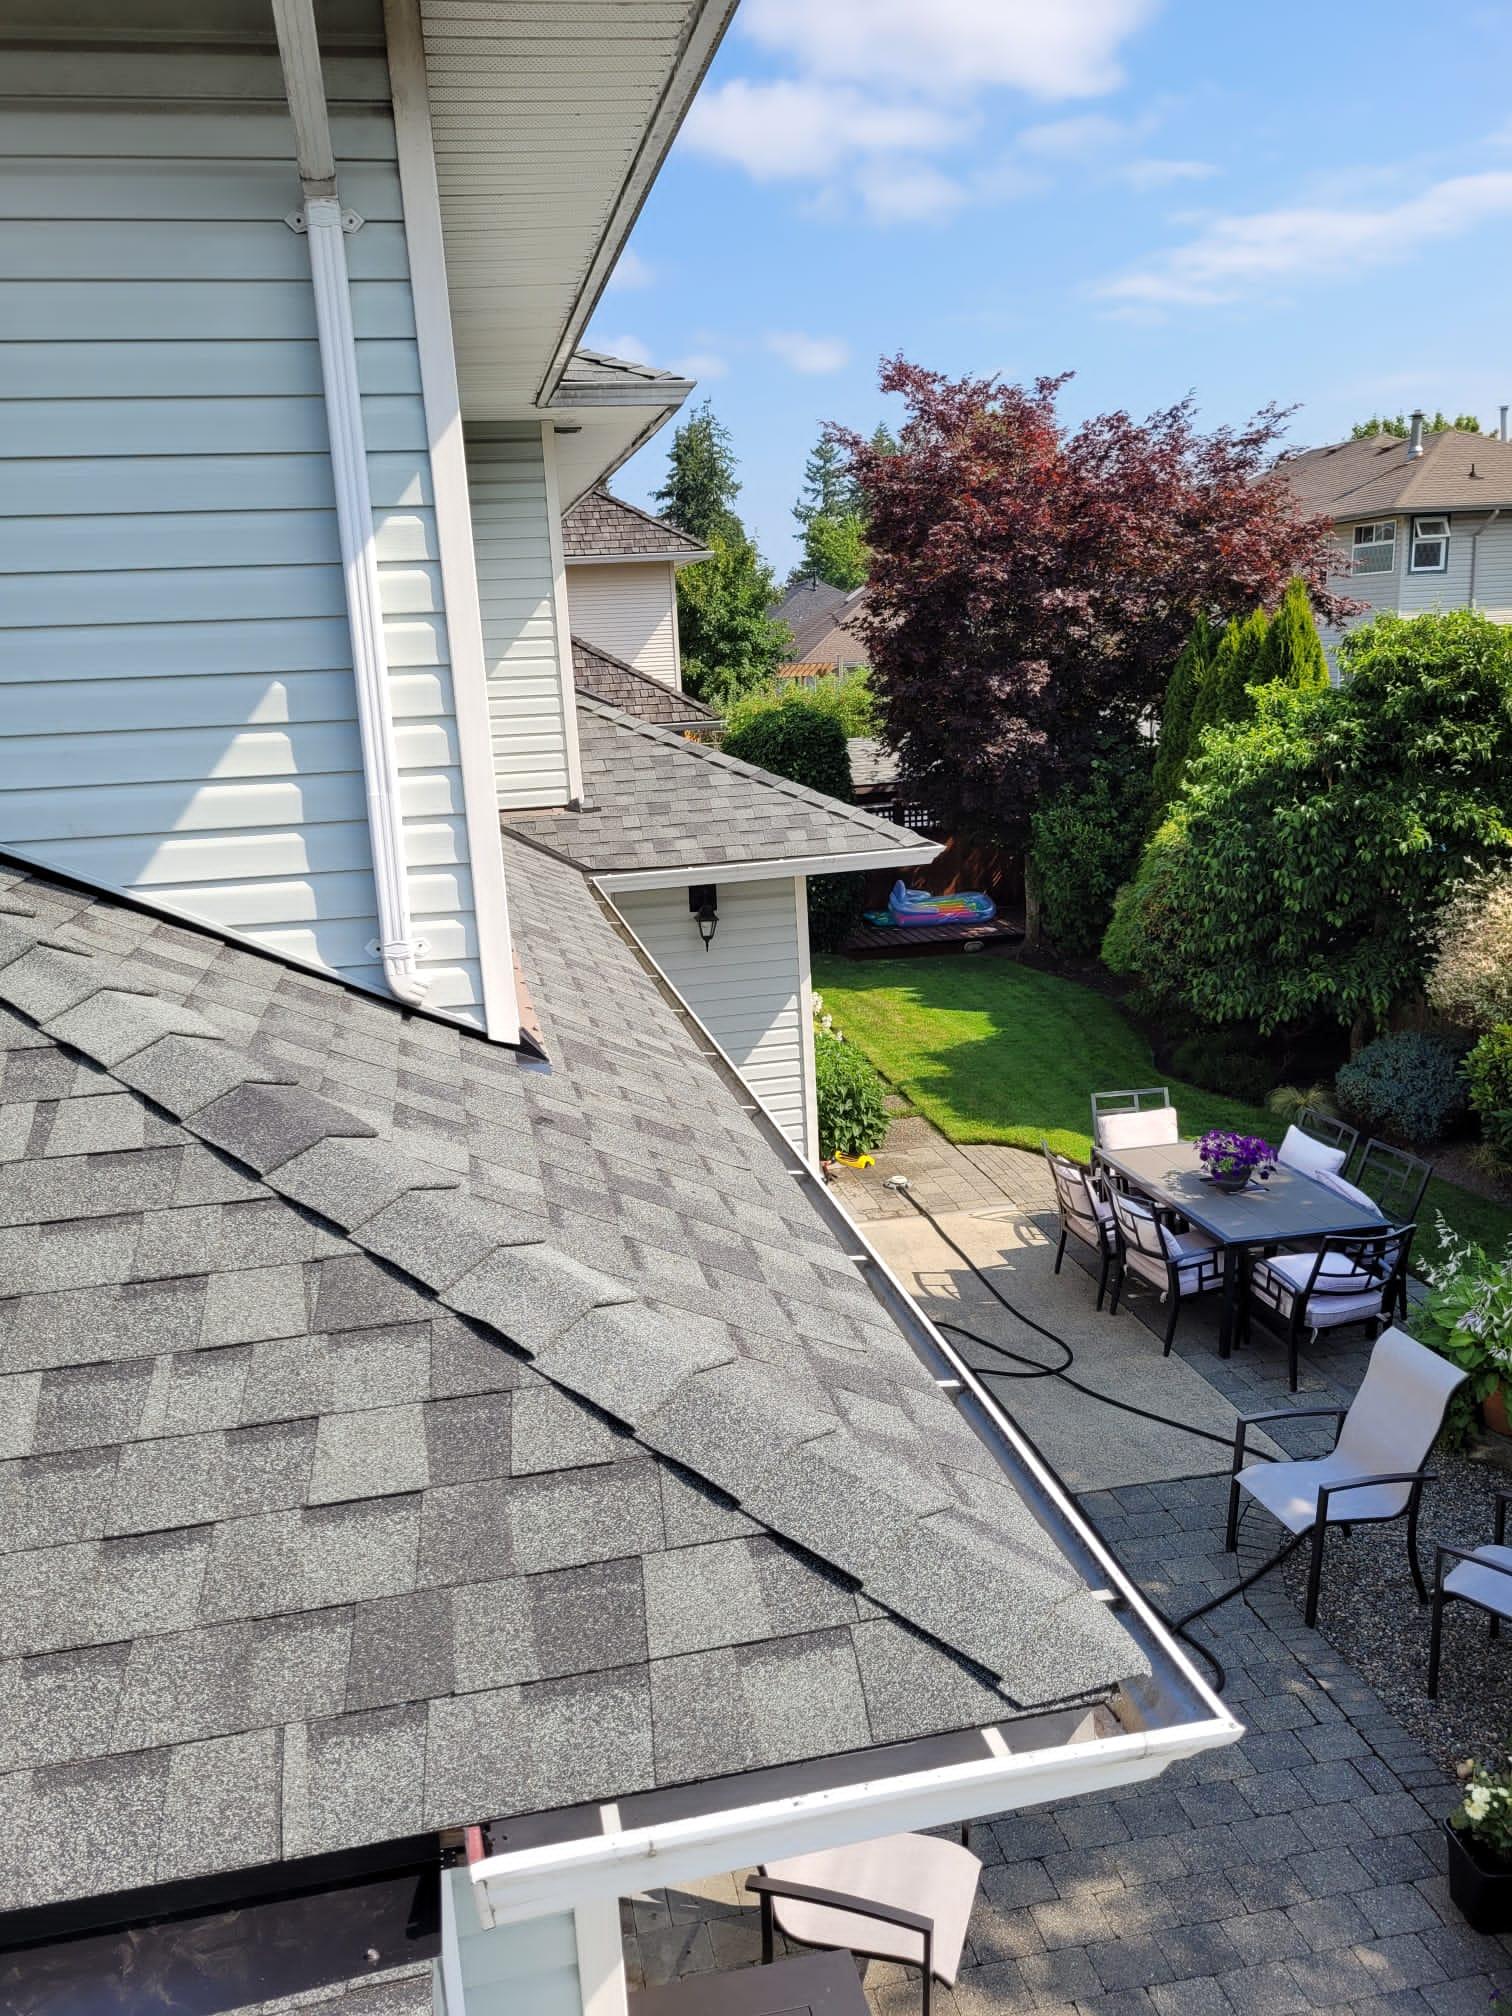 Cedar conversion to asphalt shingle BQR recently completed